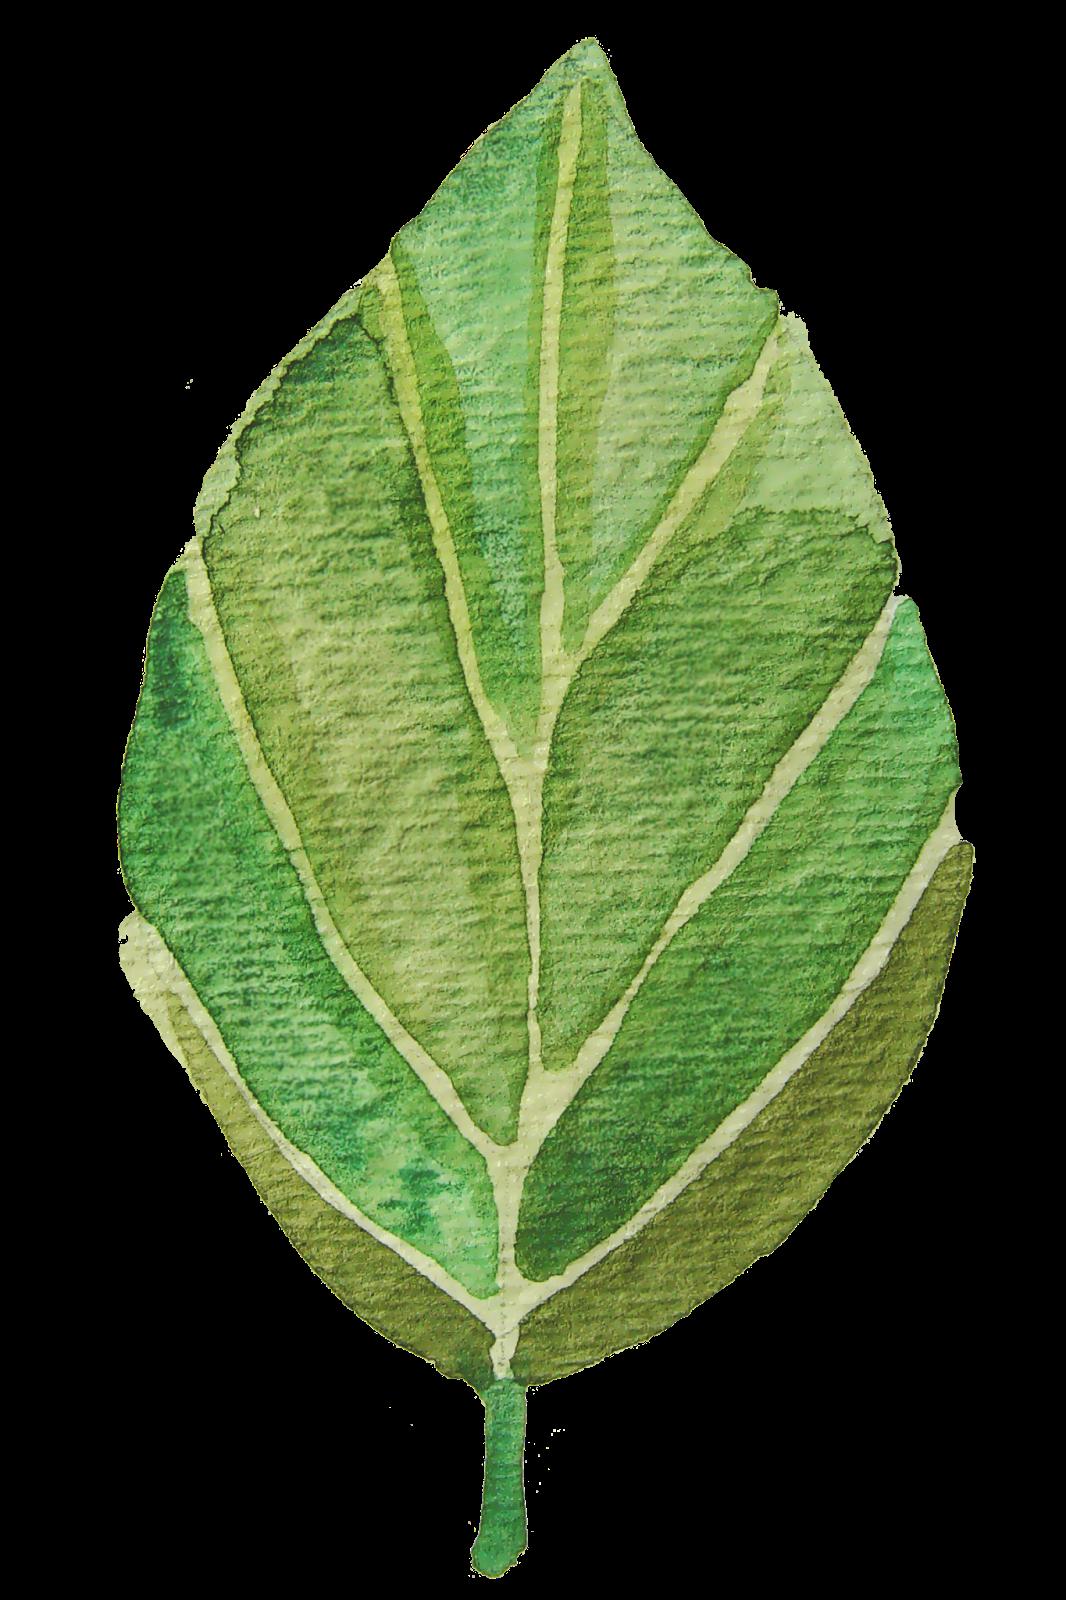 Tree clipart watercolor. Leaf green scrapbook pesquisa